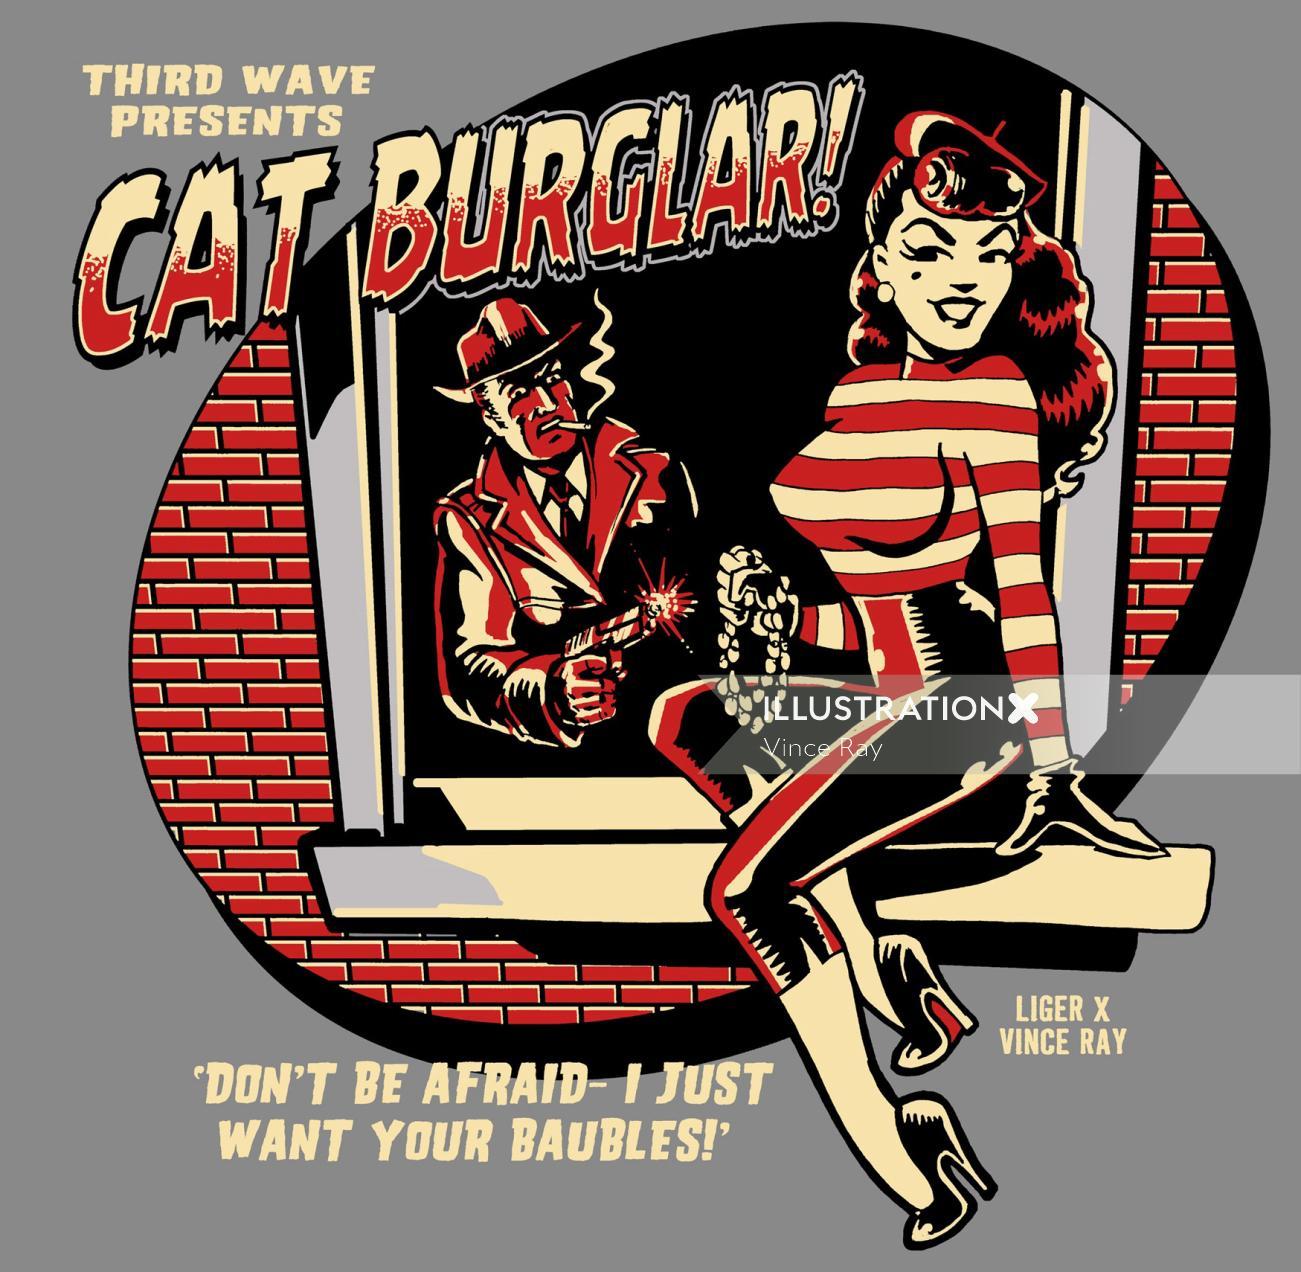 Cat women and  criminal